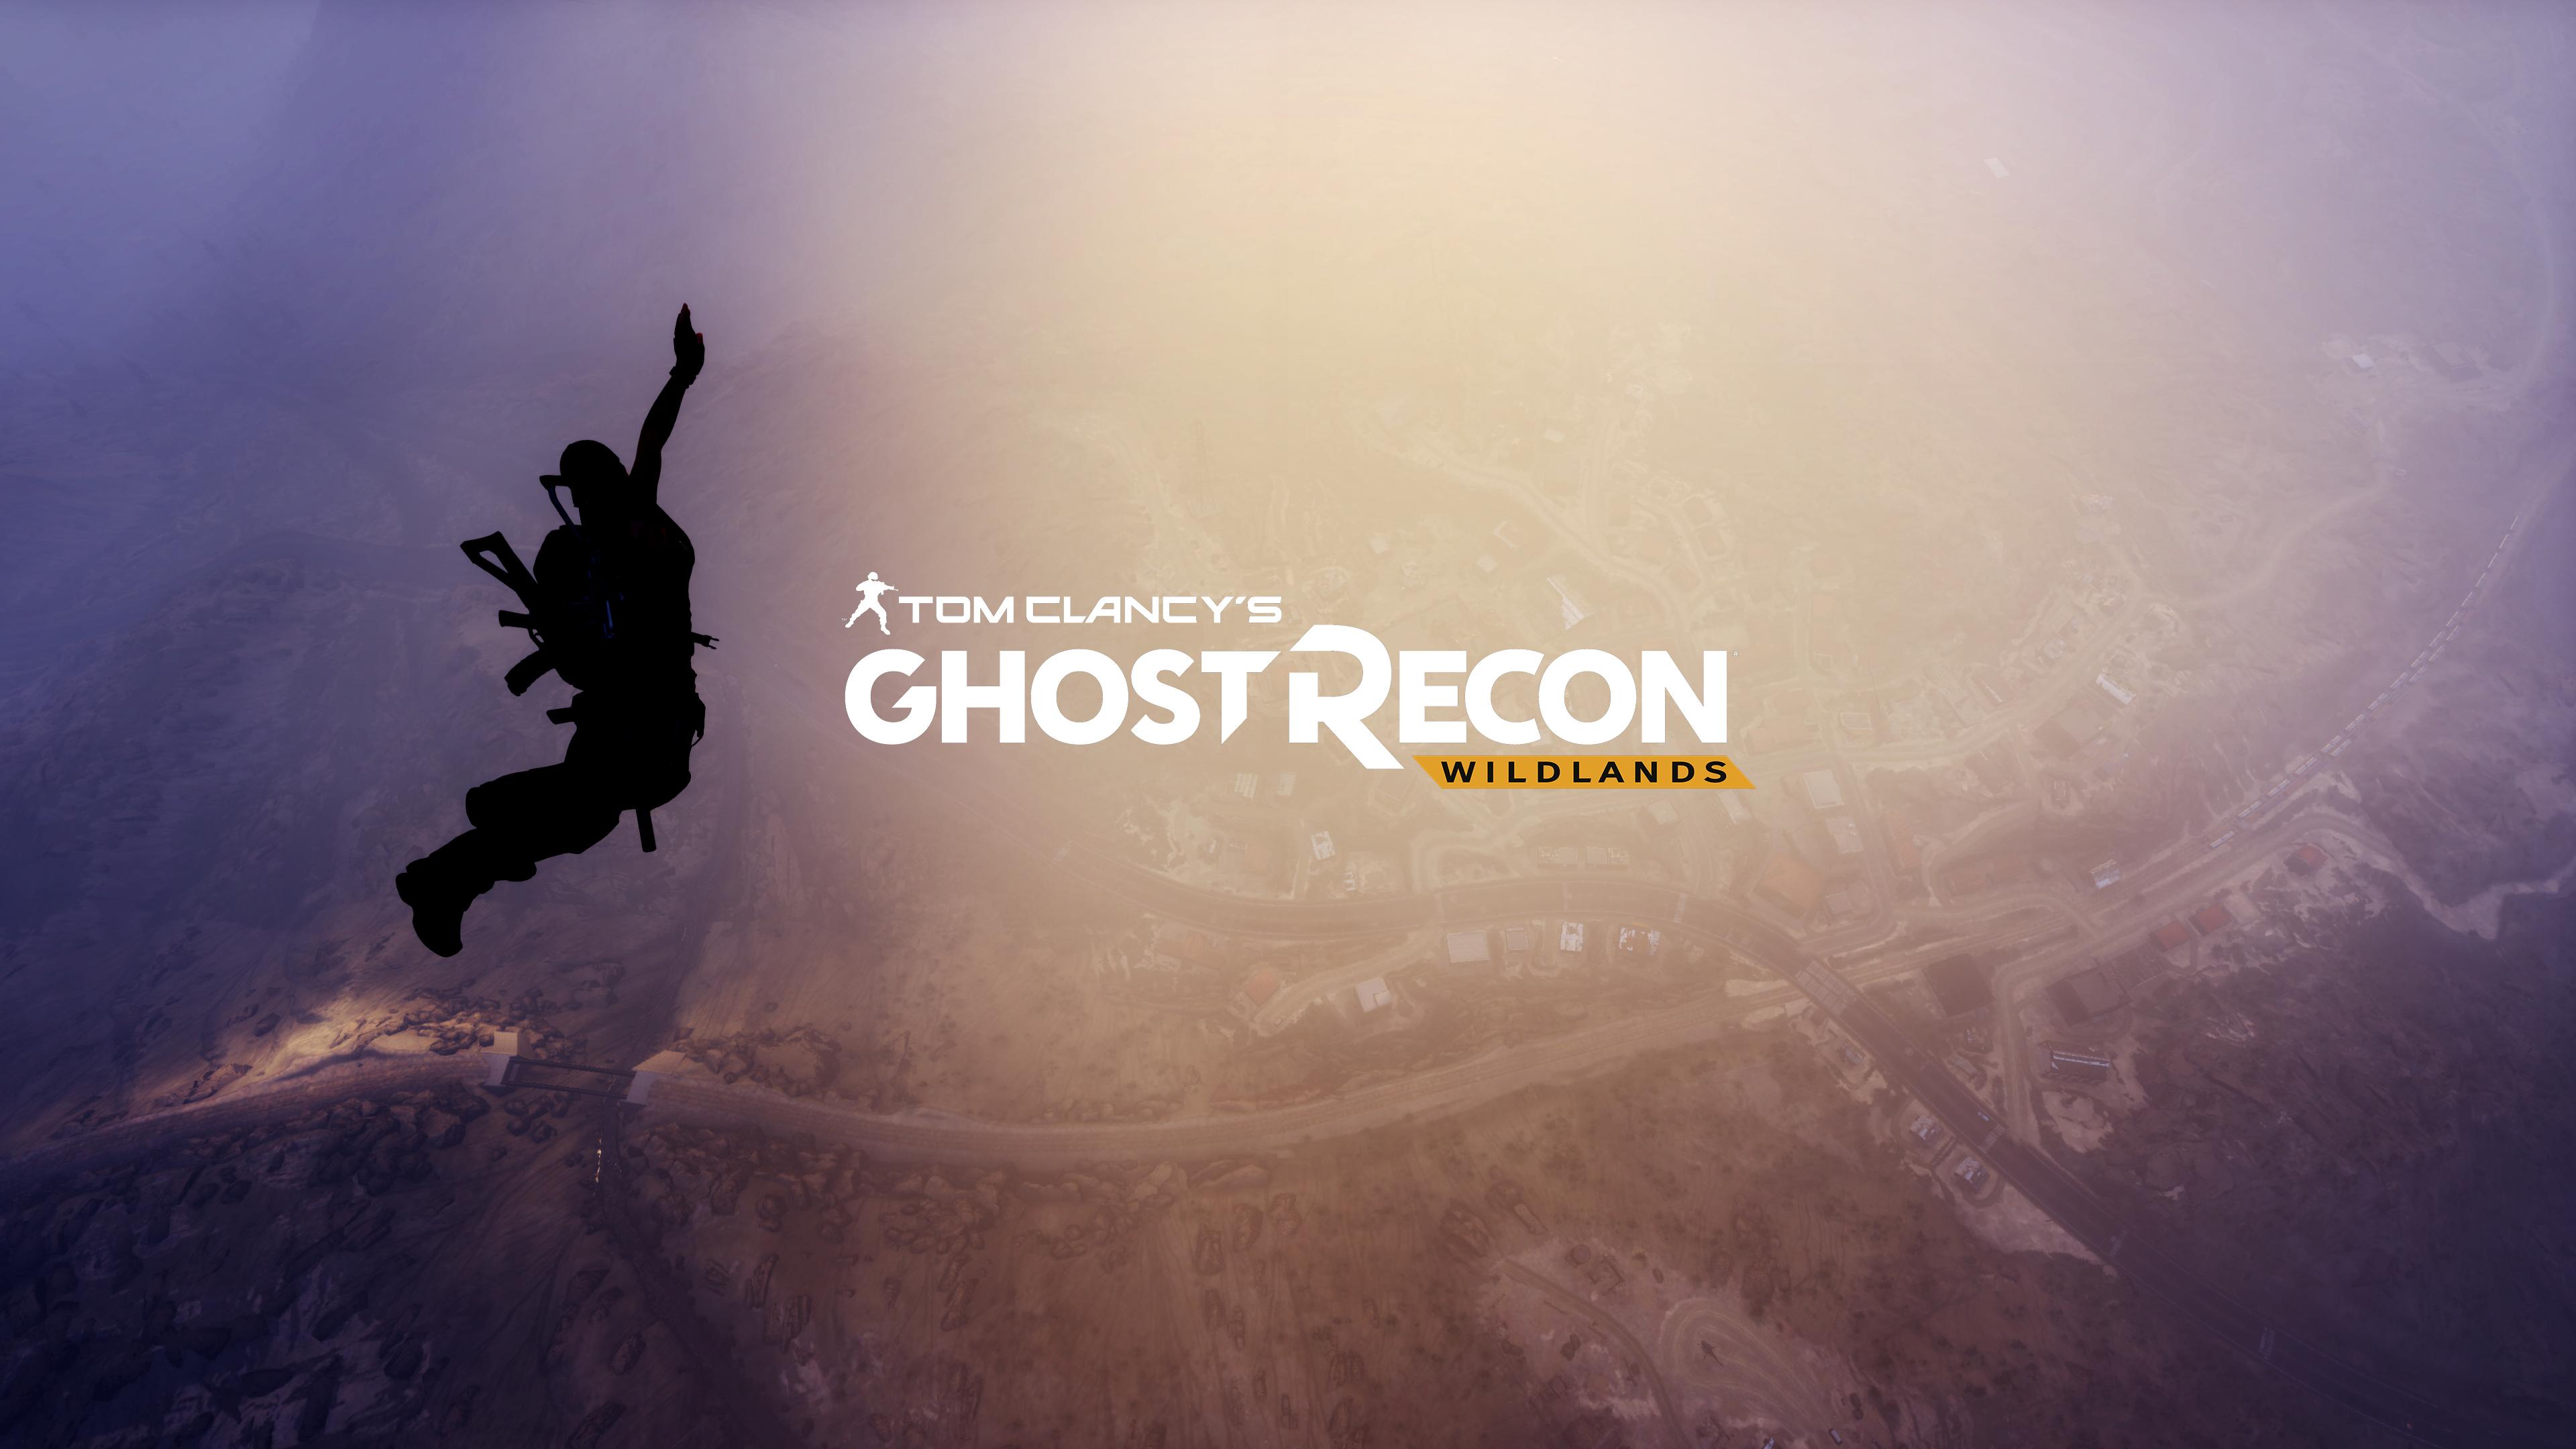 Tom Clancys Ghost Recon Wildlands 2017 Hd Games 4k: Tom Clancys Ghost Recon Wildlands 4k Logo, HD Games, 4k